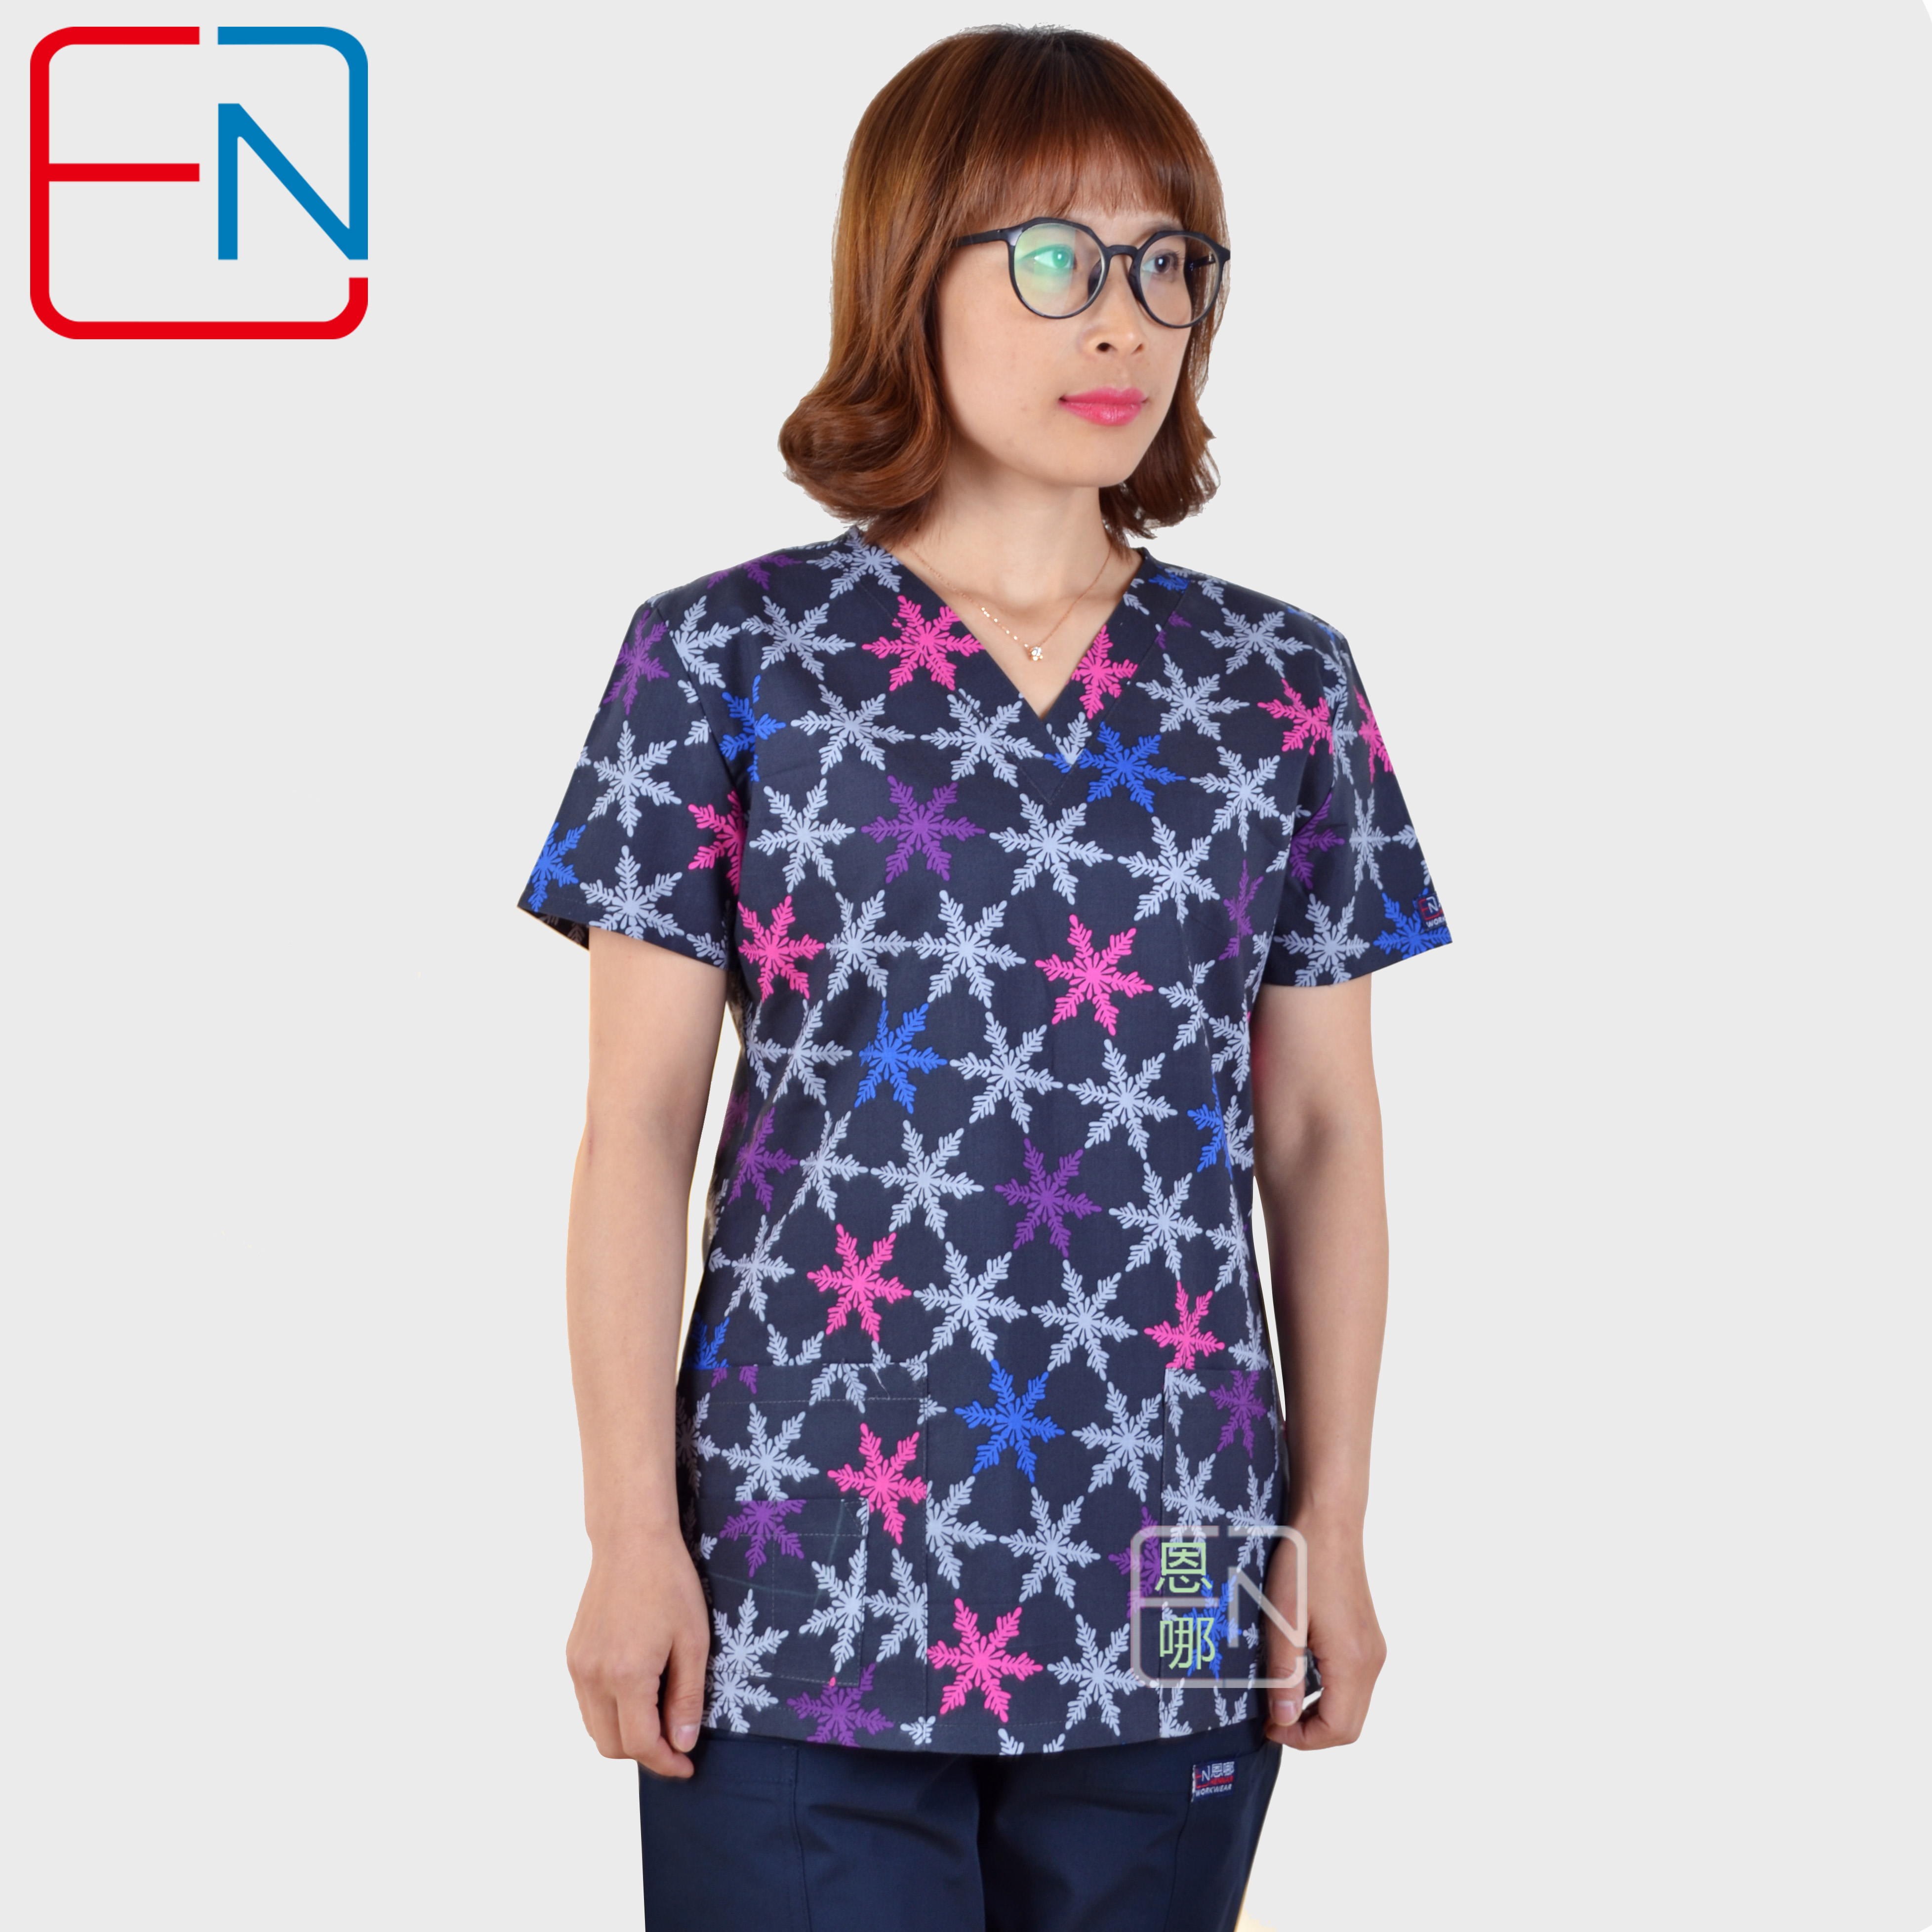 5 DESIGNS IN  Hennar Brand Medical Scrub Tops Surgical Scrubs,scrub Uniform 100% Print Cotton Christmas Design Medical Uniforms